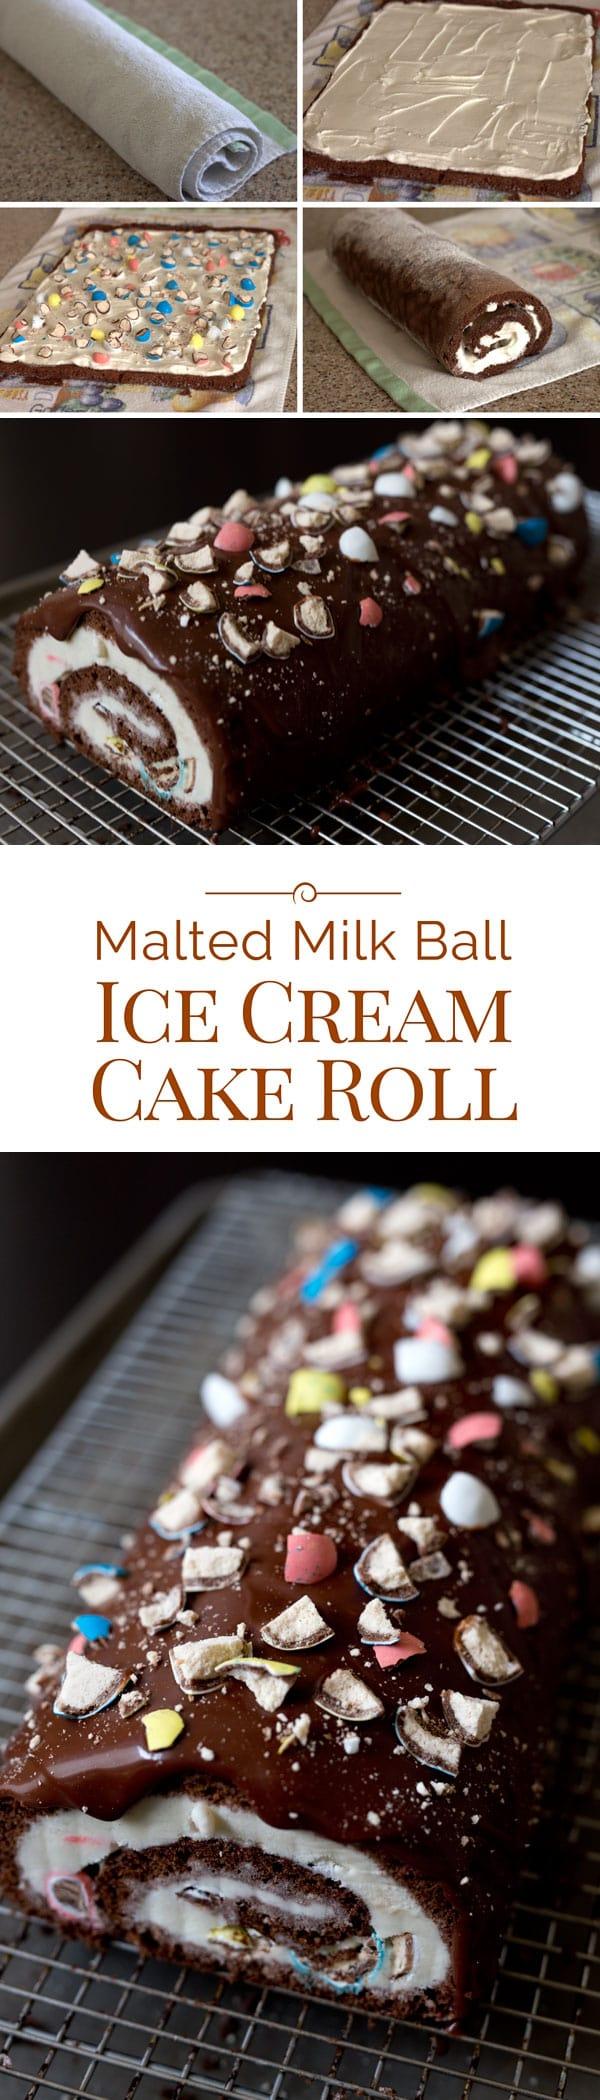 Malted-Milk-Ball-Ice-Cream-Cake-Roll-Collage-Barbara-Bakes